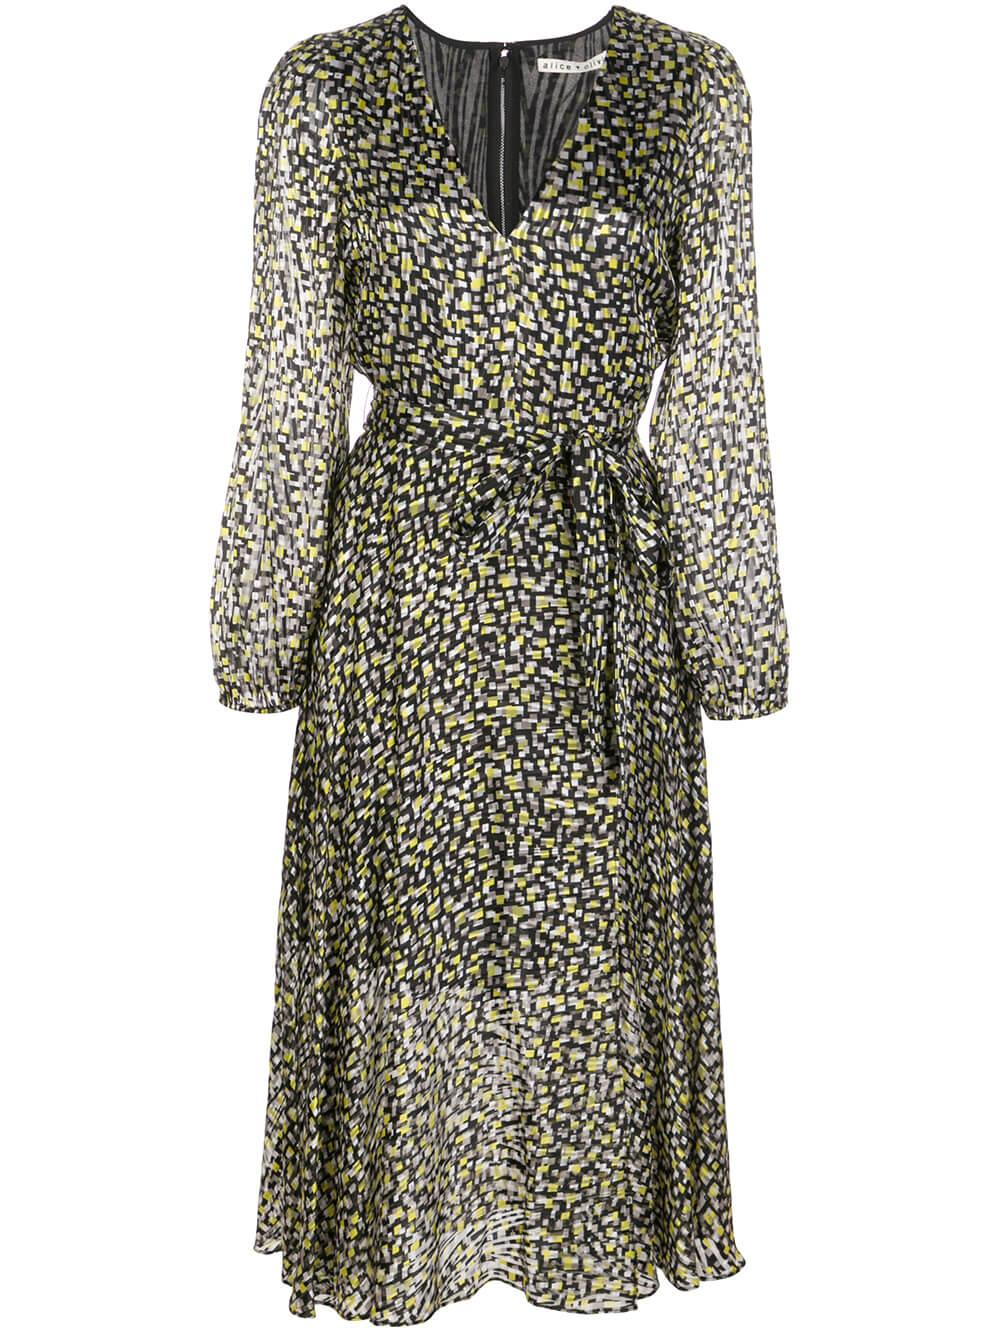 Coco V Neck Velvet Burnout Dress Item # CC911B72507